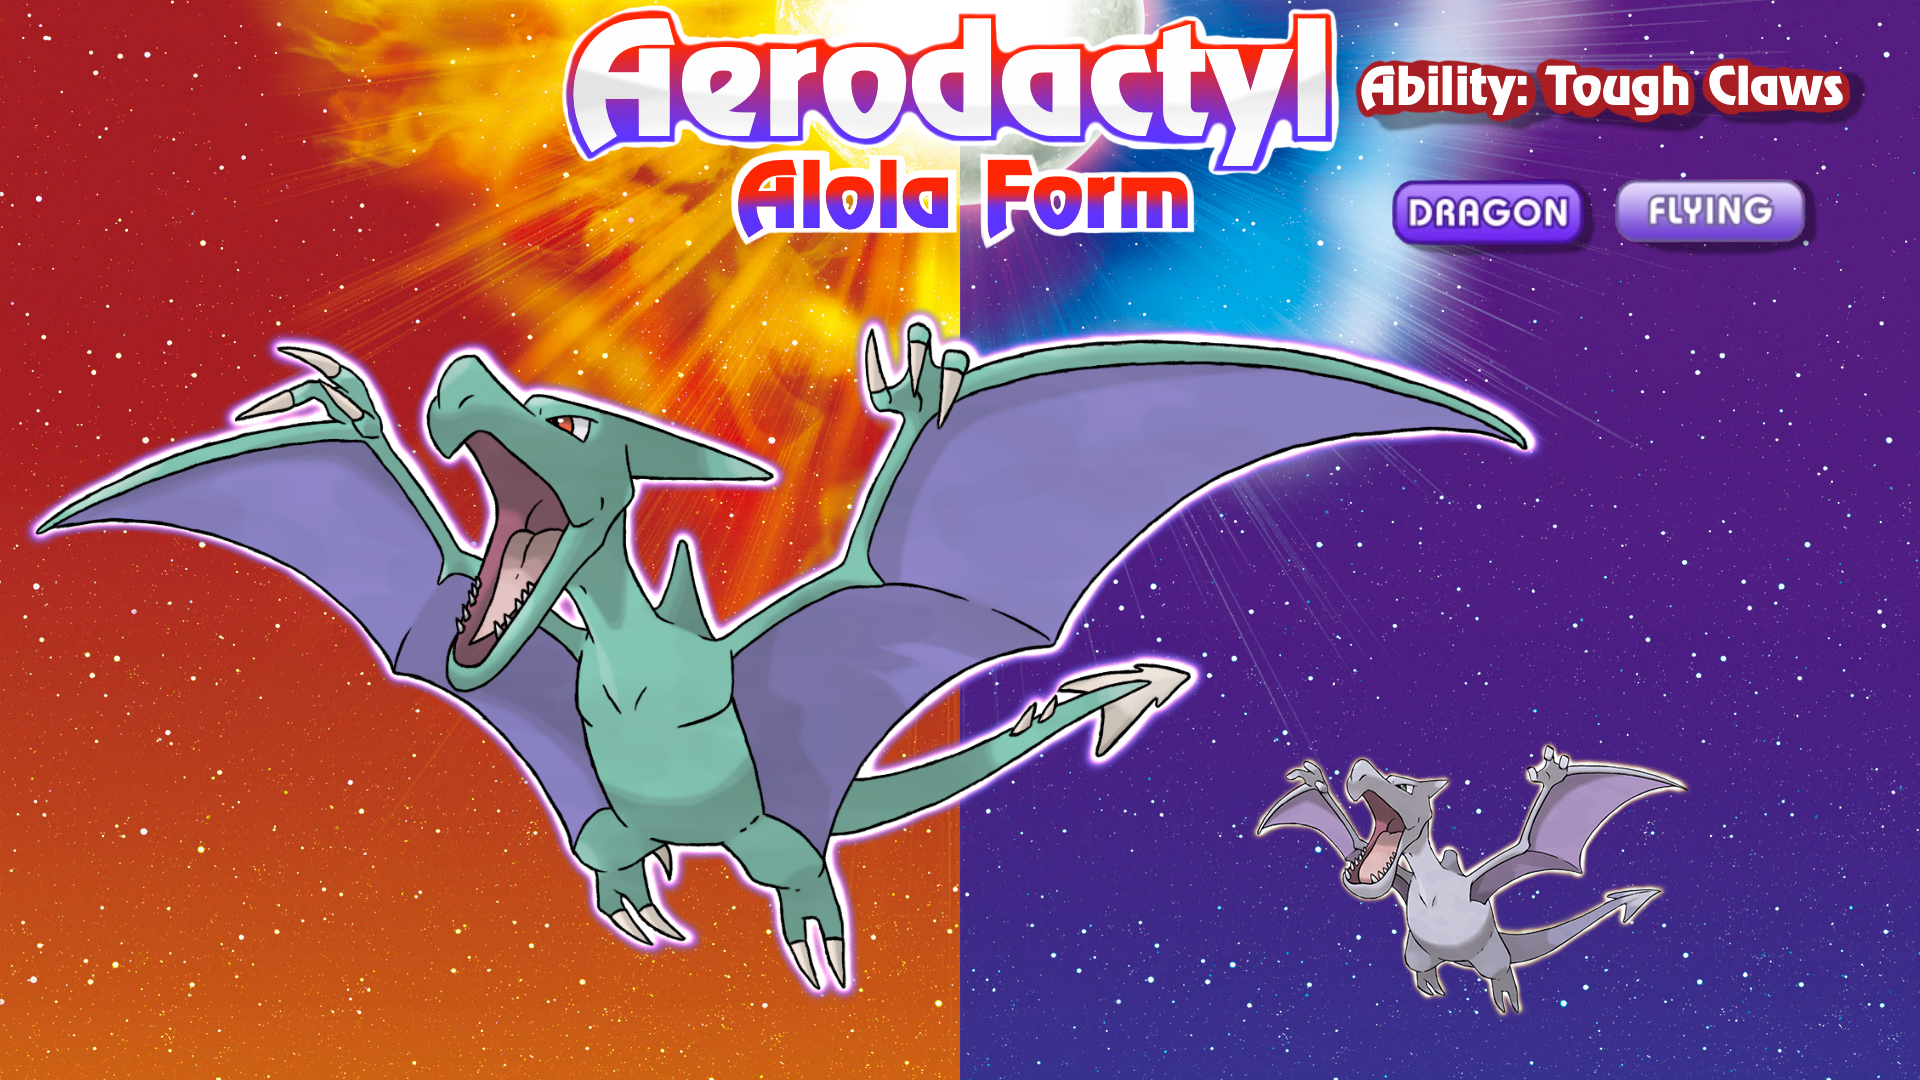 Alolan Form Aerodactyl